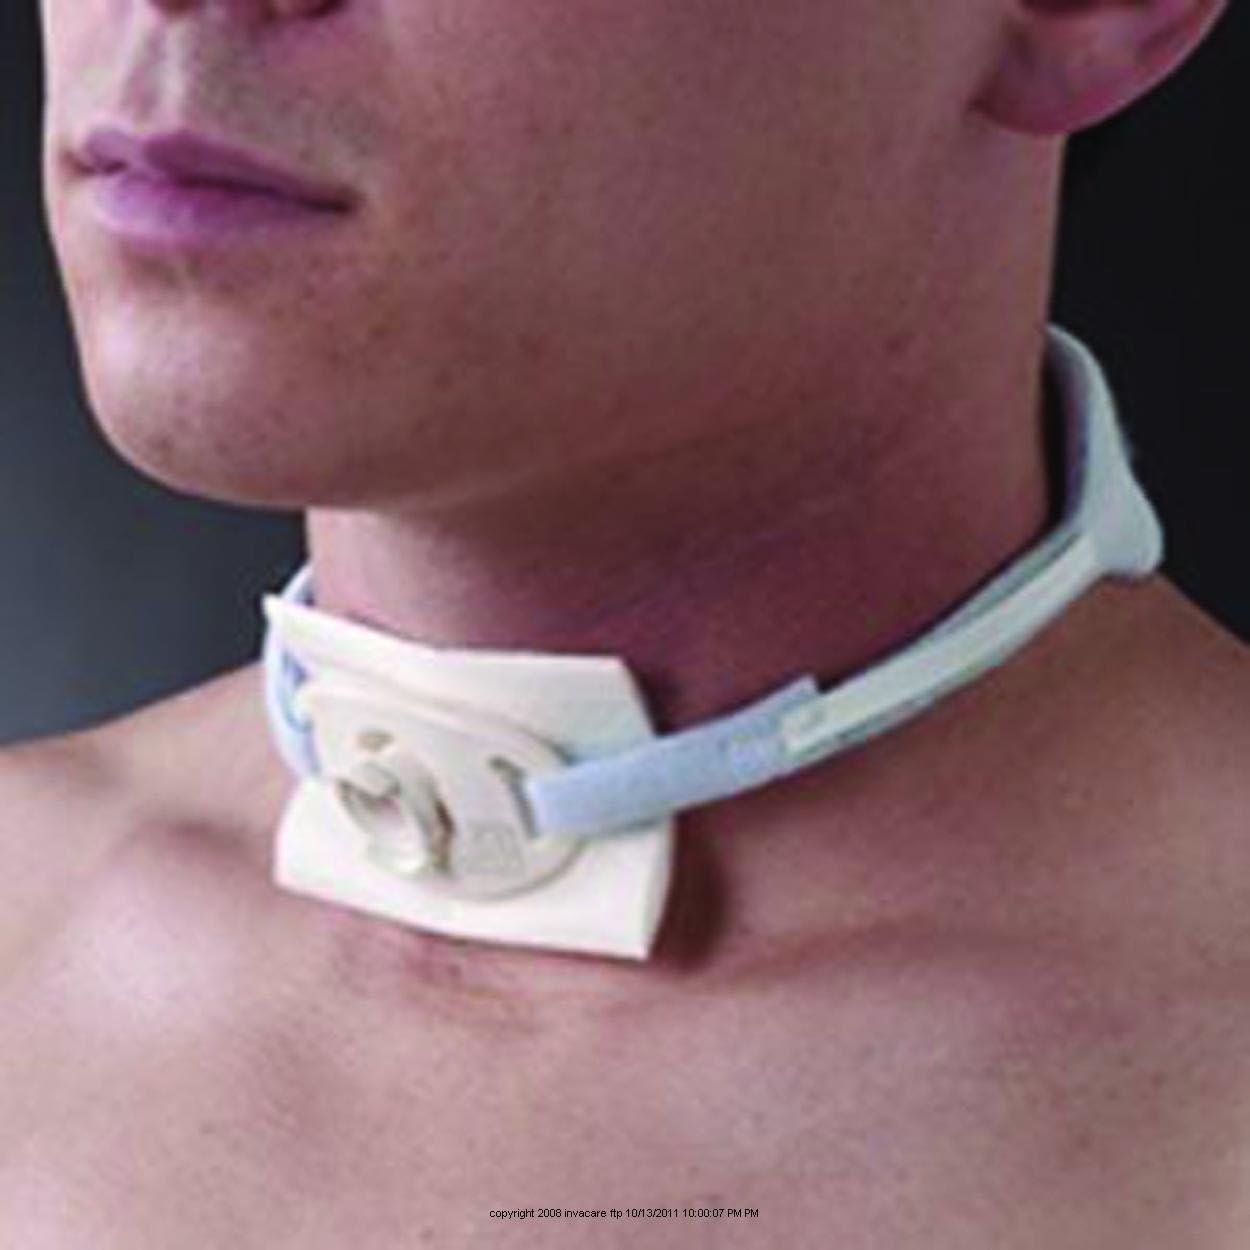 Foam Trach Collar half Tie Ties 1 BOX 12 Ranking TOP17 EACH Med